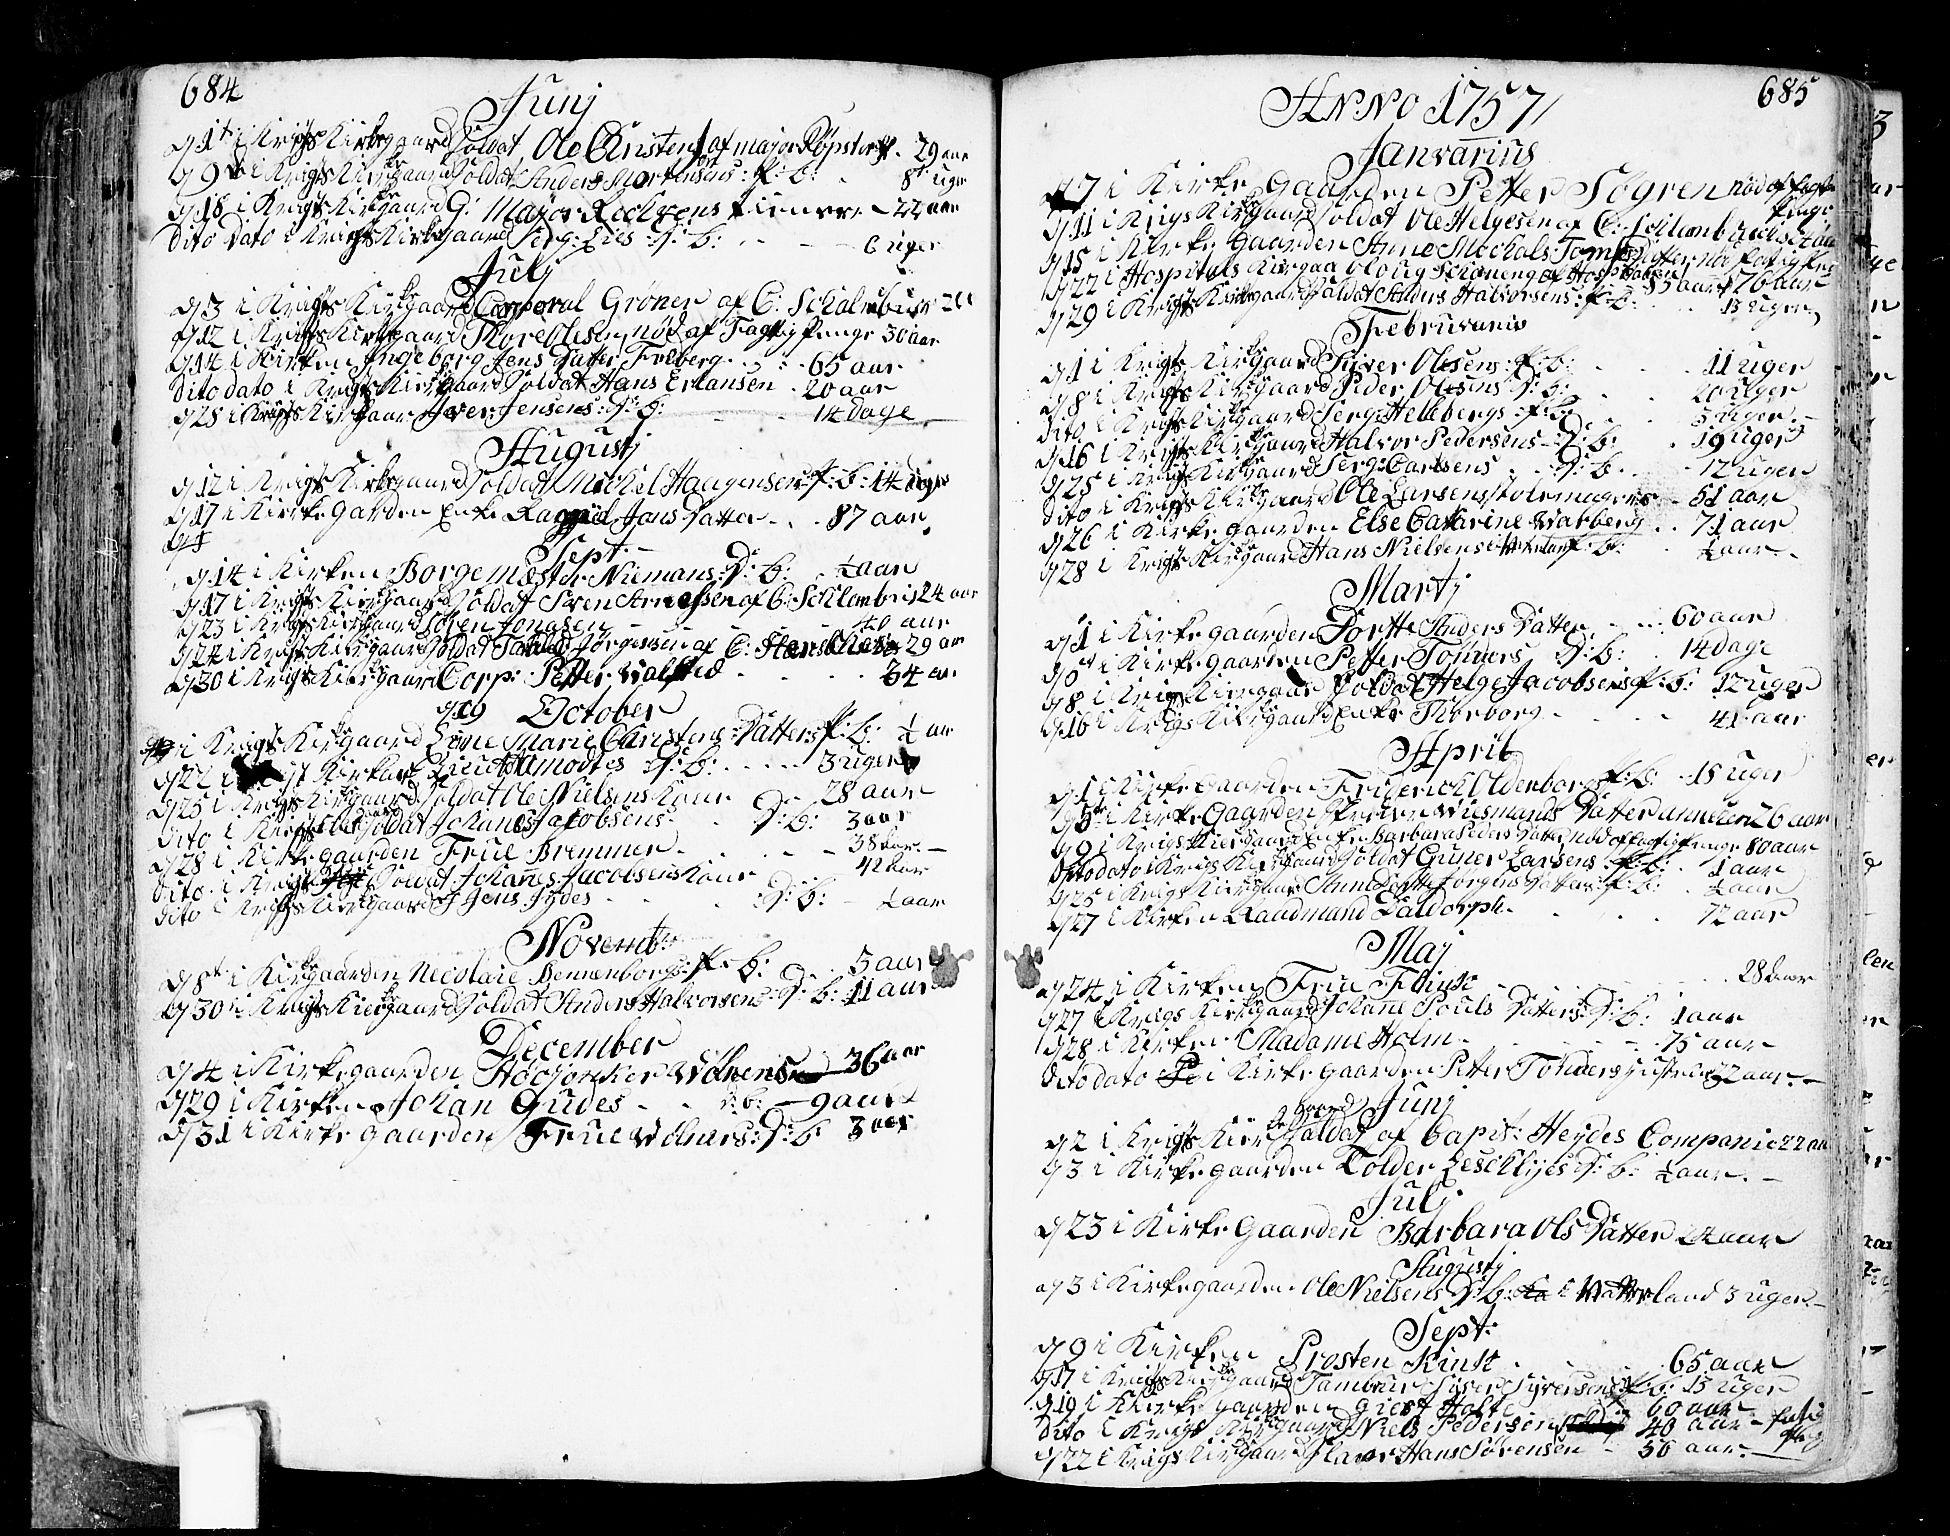 SAO, Fredrikstad prestekontor Kirkebøker, F/Fa/L0002: Ministerialbok nr. 2, 1750-1804, s. 684-685